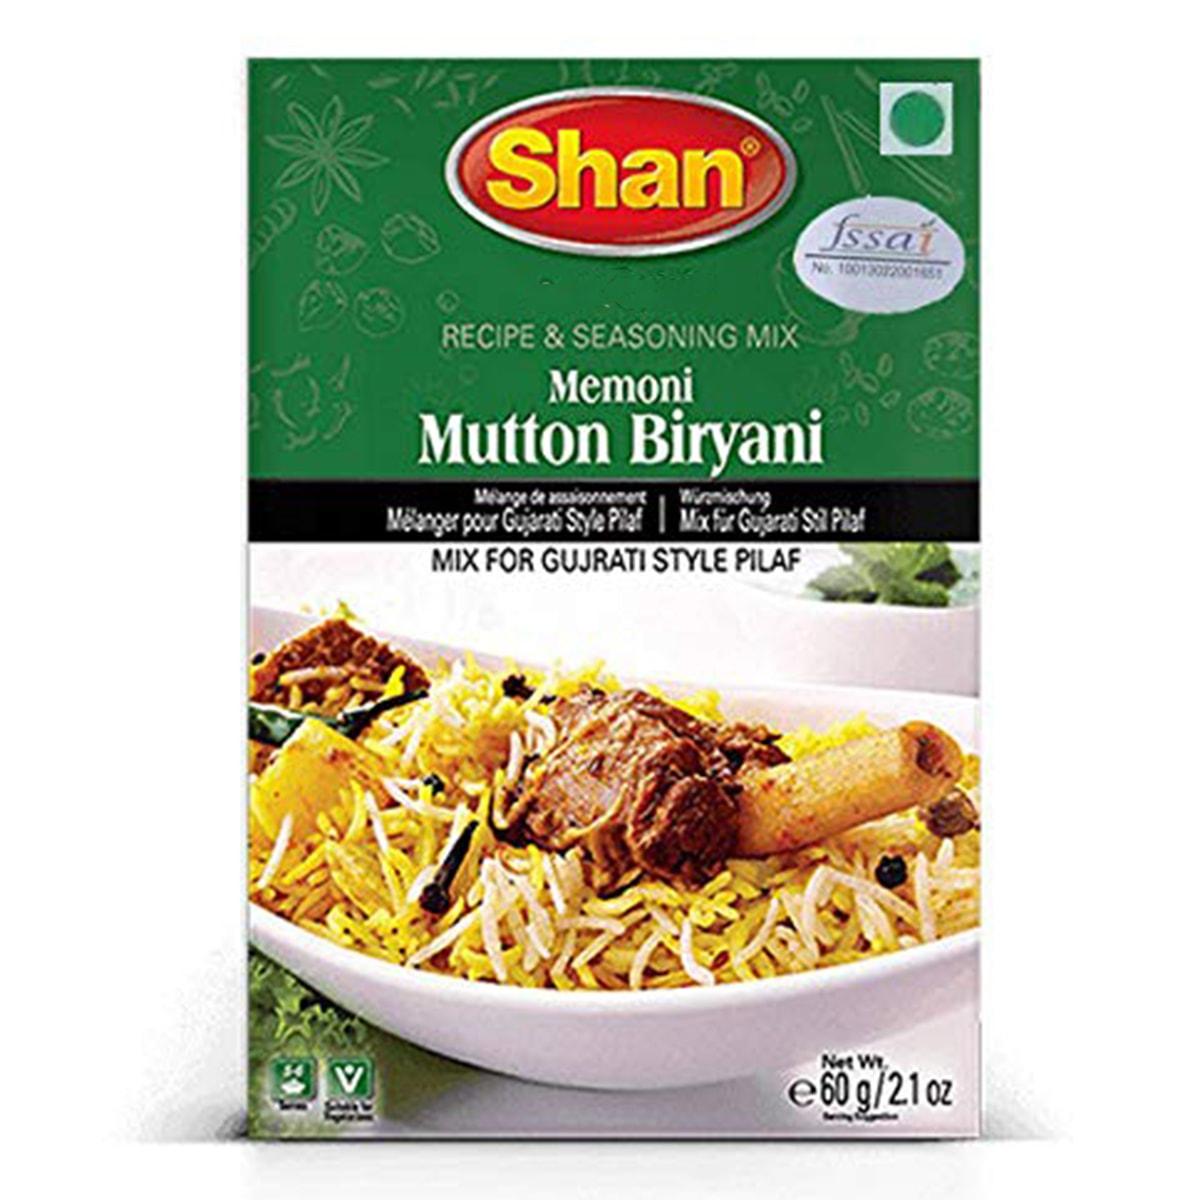 Buy Shan Memoni Mutton Biryani Mix - 60 gm